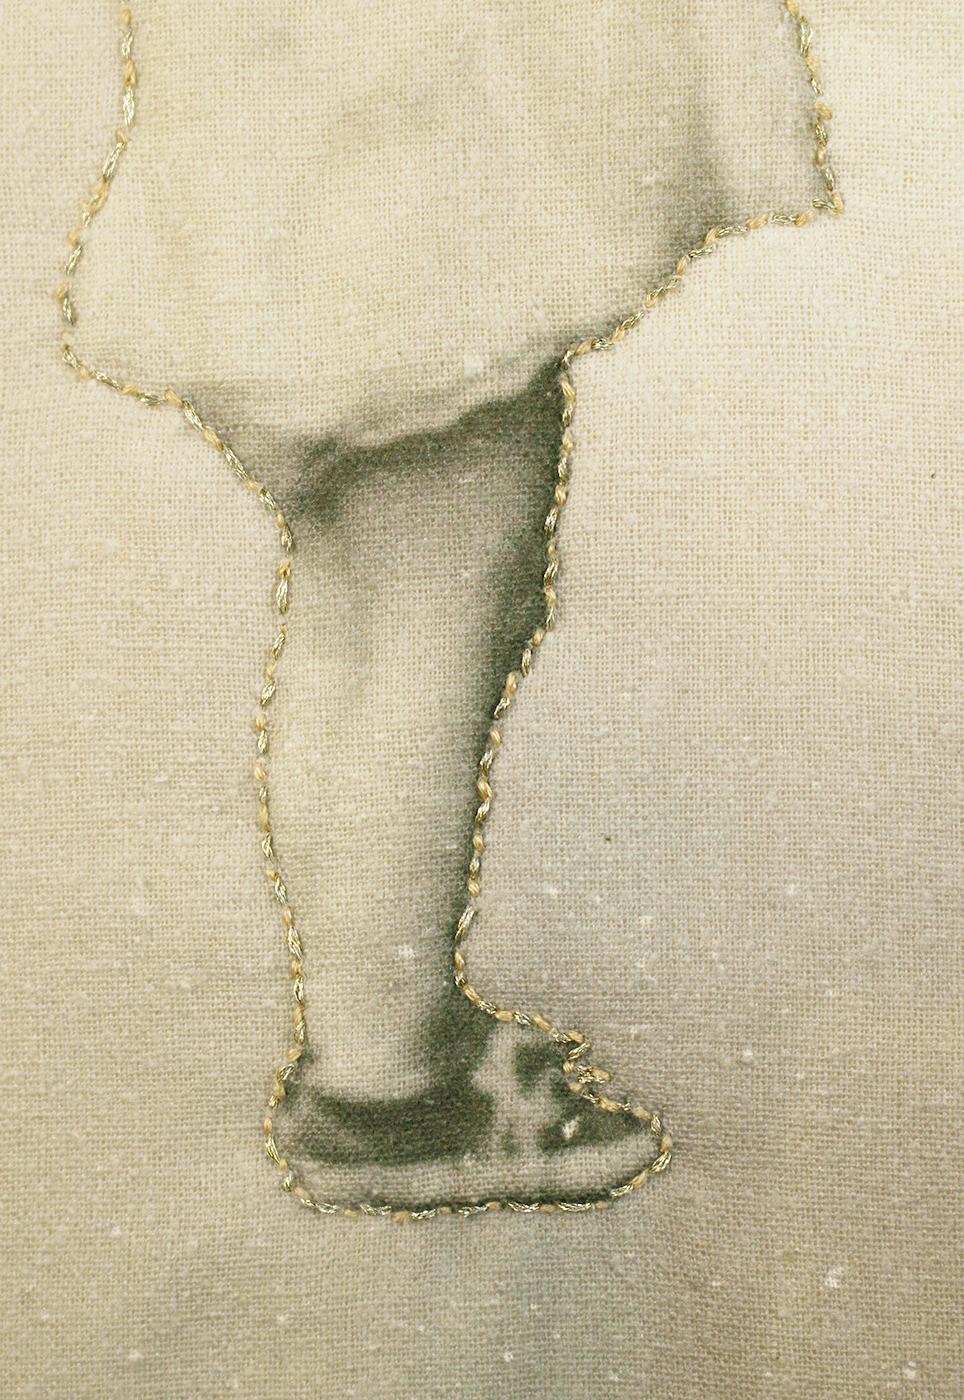 Shelley-Smith-What-The-Dream-Said-1-detail-2.jpg